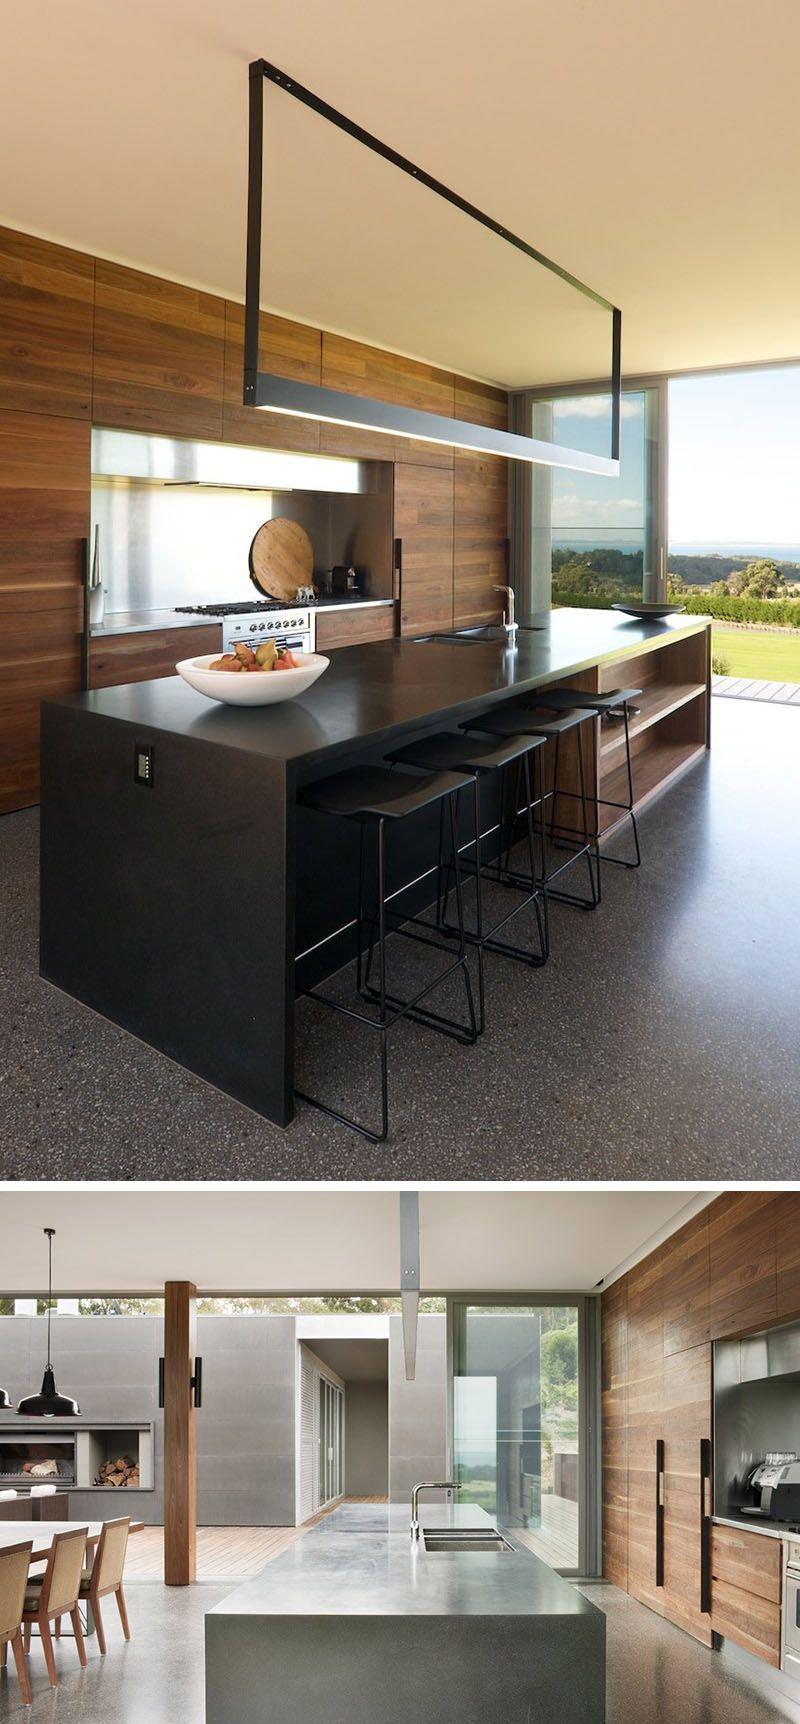 Kitchen island lighting idea use one long light instead of